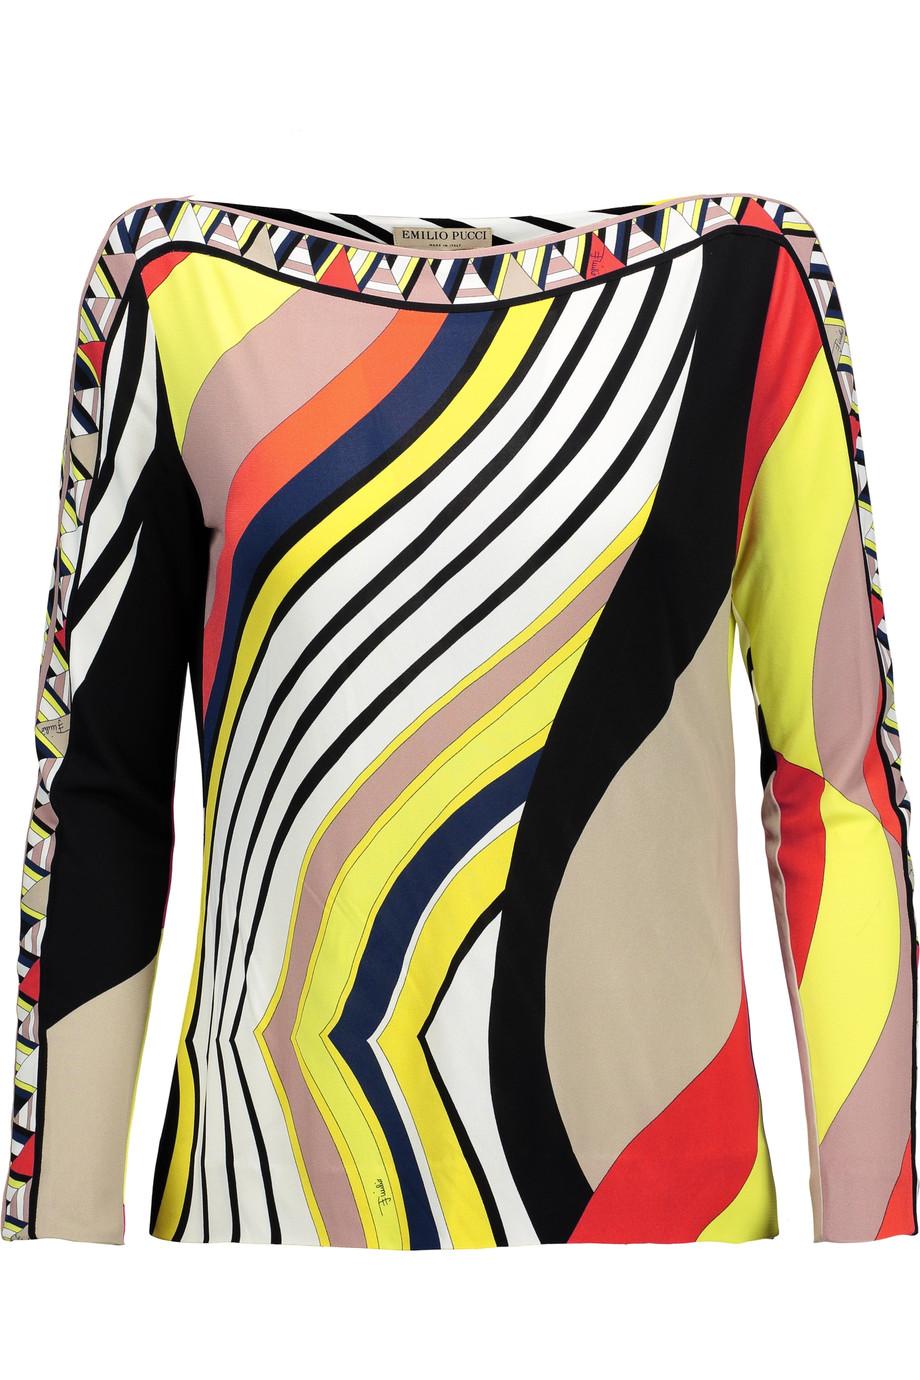 99170ebae188 Emilio Pucci Printed Jersey Top